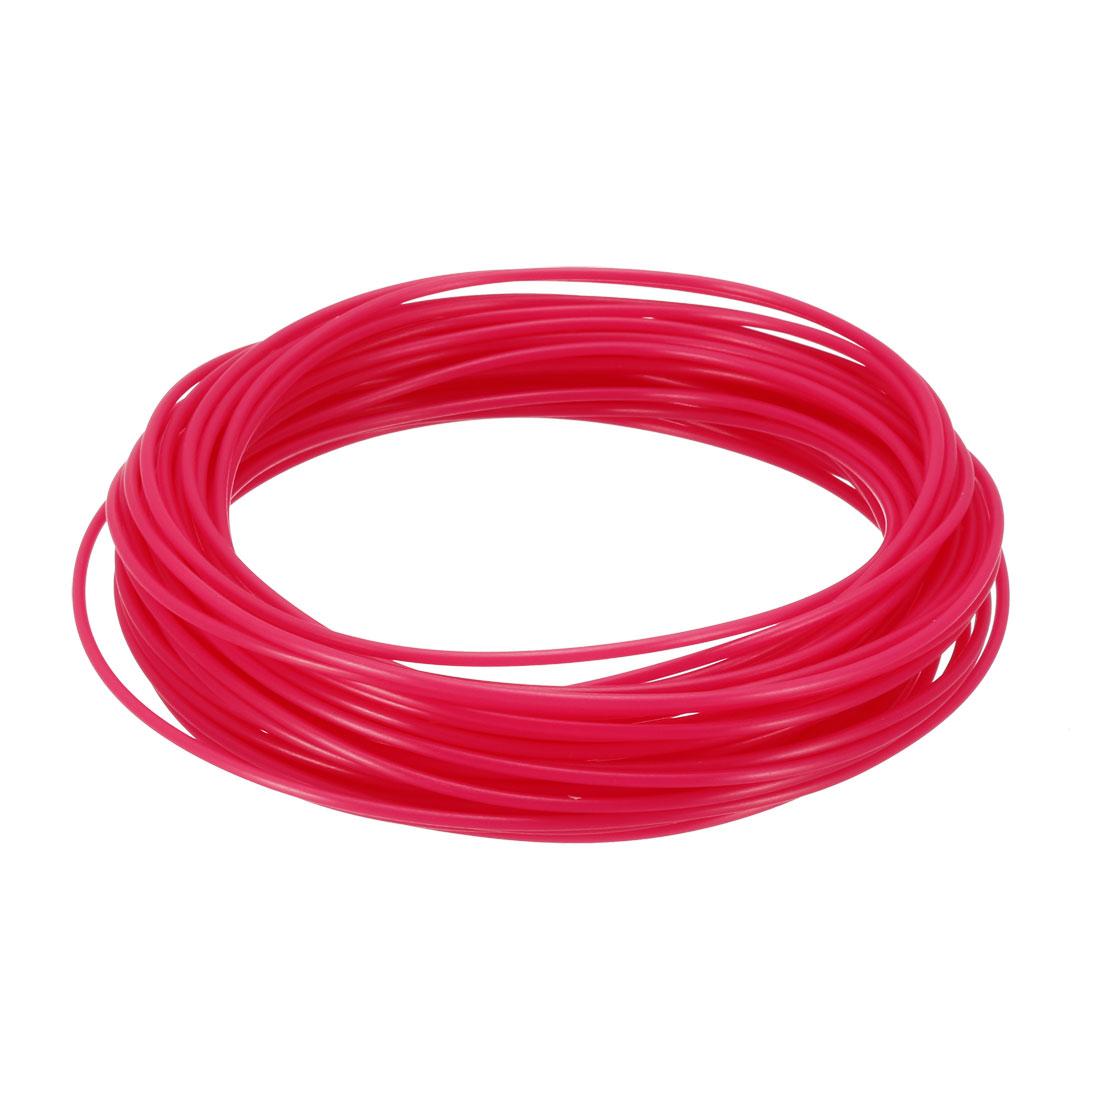 10 Meter/32.5 Ft PLA 3D Pen/3D Printer Filament, 1.75 mm Fluorescent Red